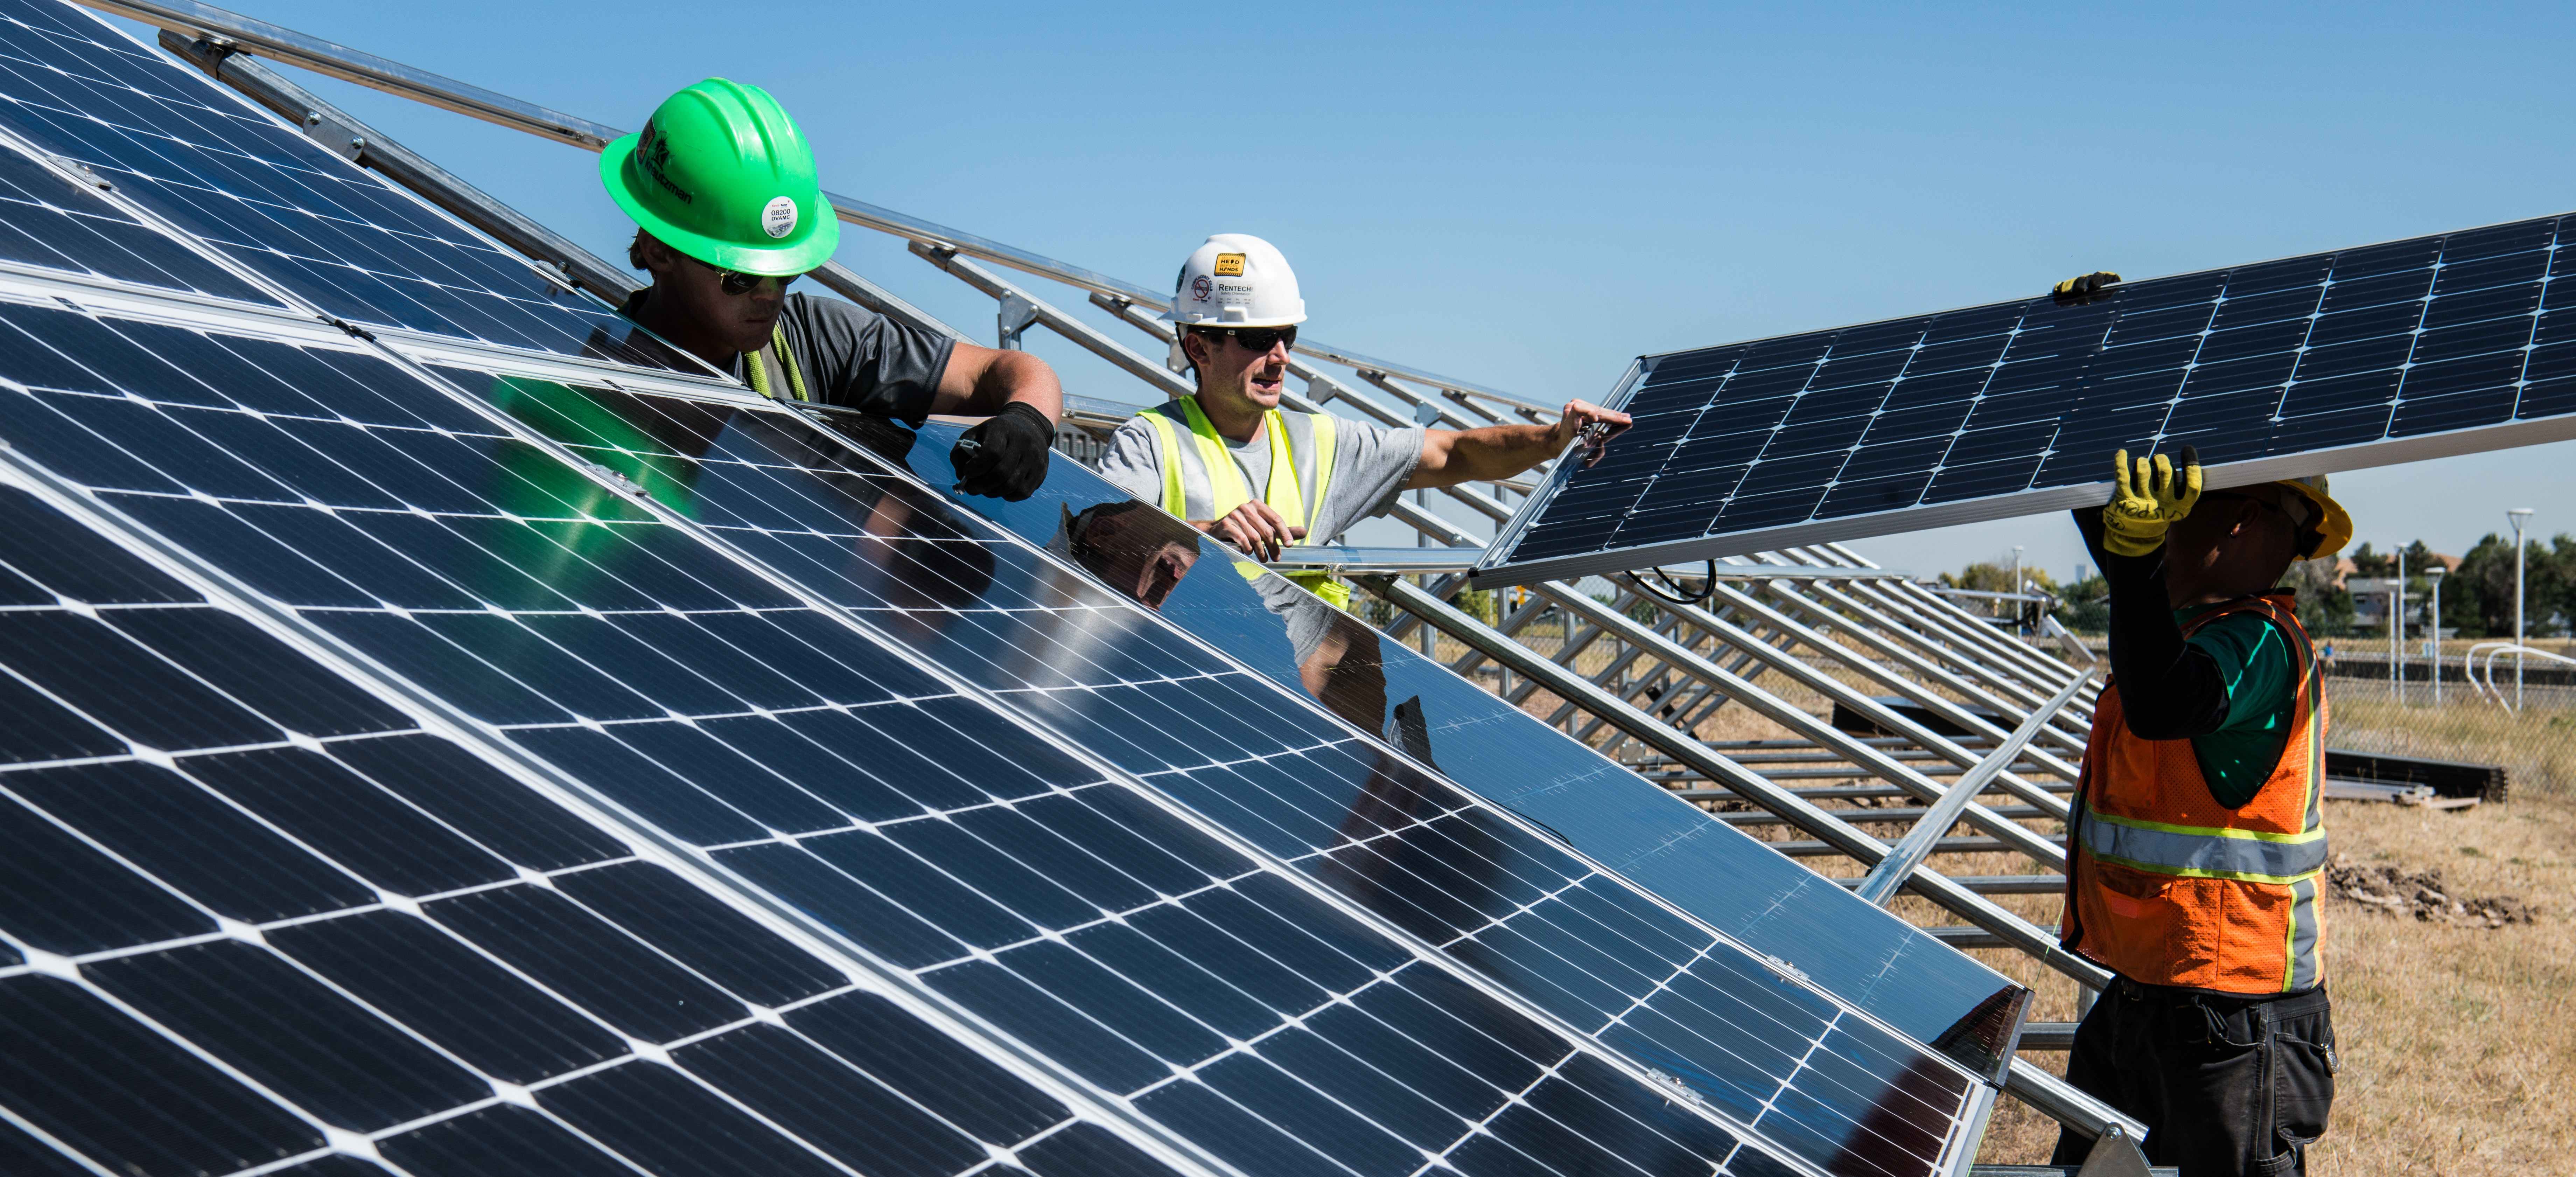 Solarstudie-2020-Autarkie